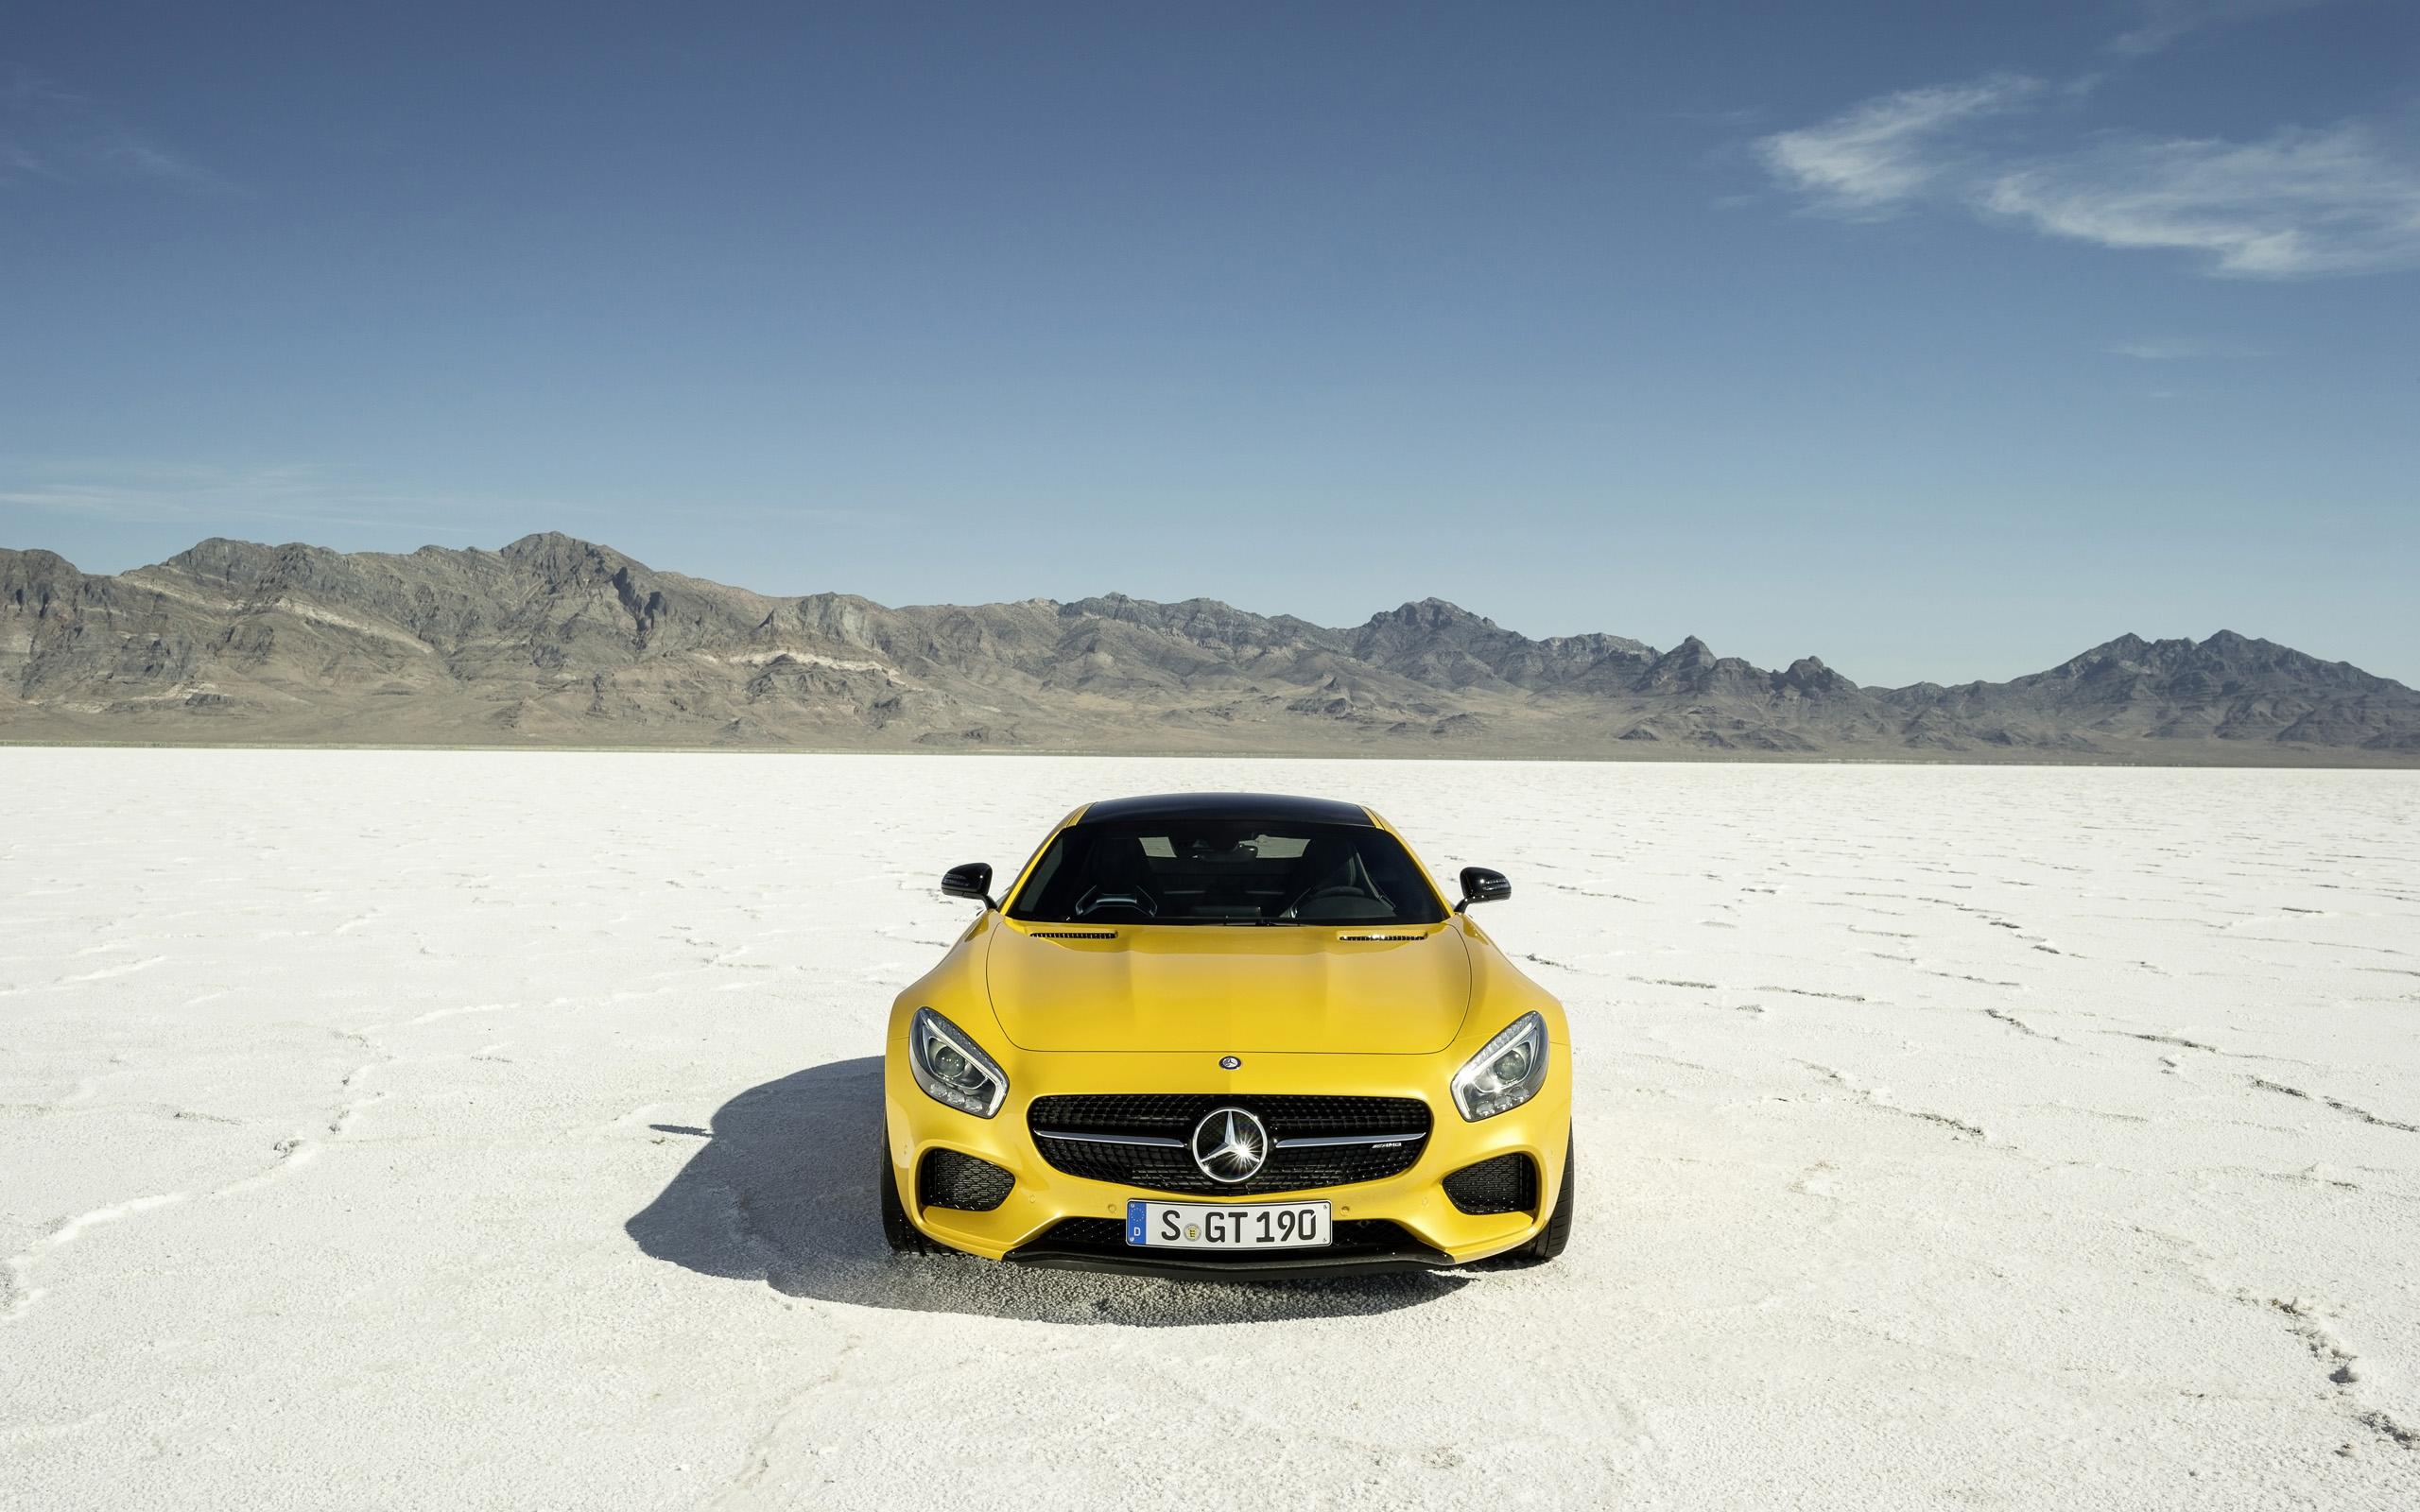 2015 Mercedes Amg Gt Solarbeam 2 Wallpaper Hd Car Wallpapers Id